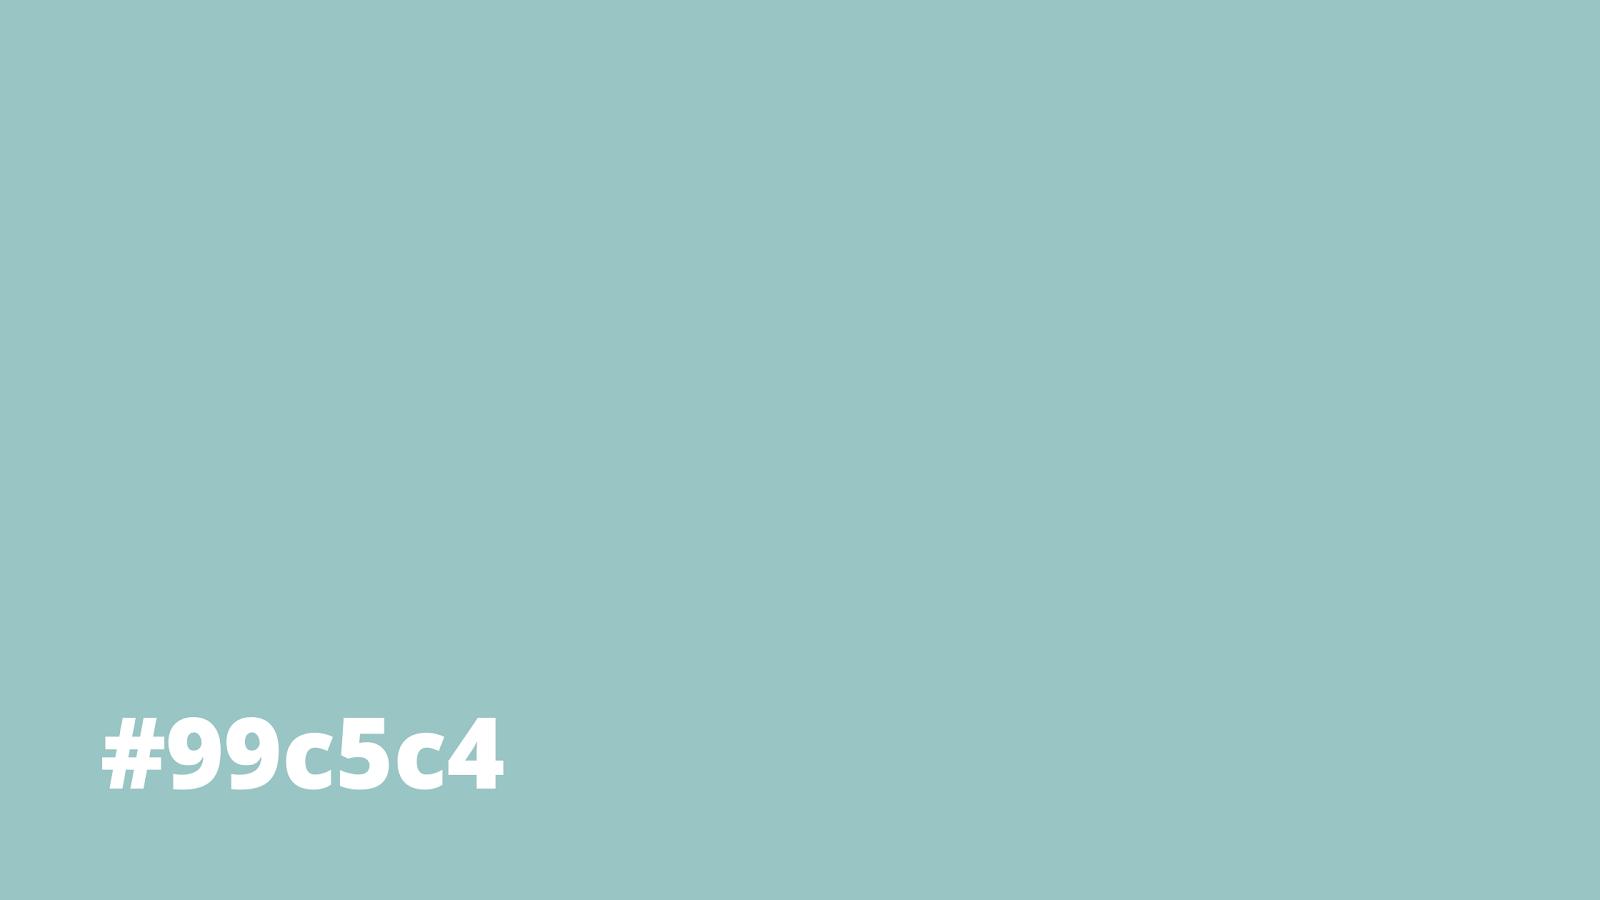 Pastel Turquoise